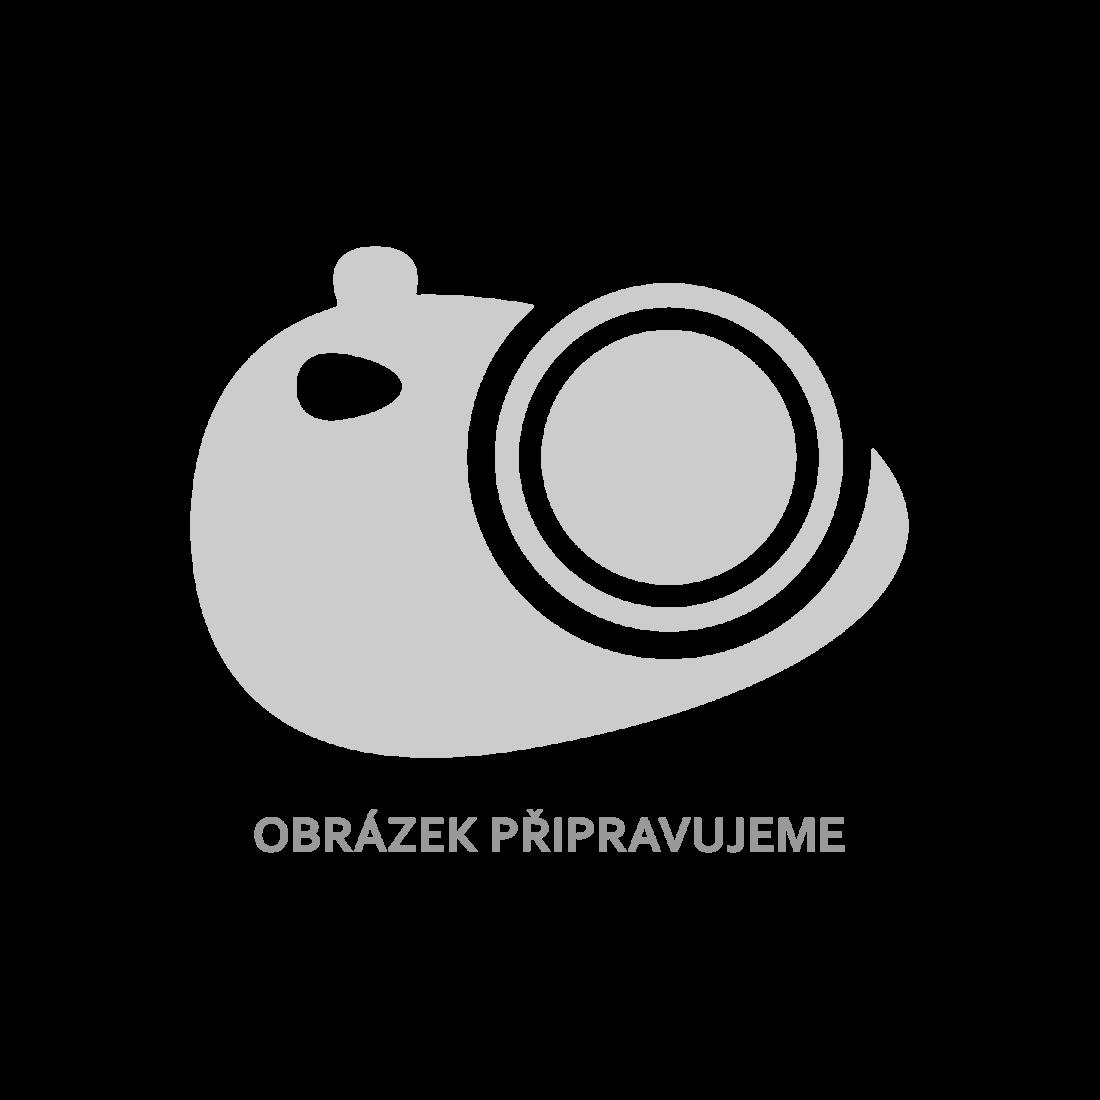 vidaXL 5dílný paraván polyratan hnědý 300 x 200 cm [47835]